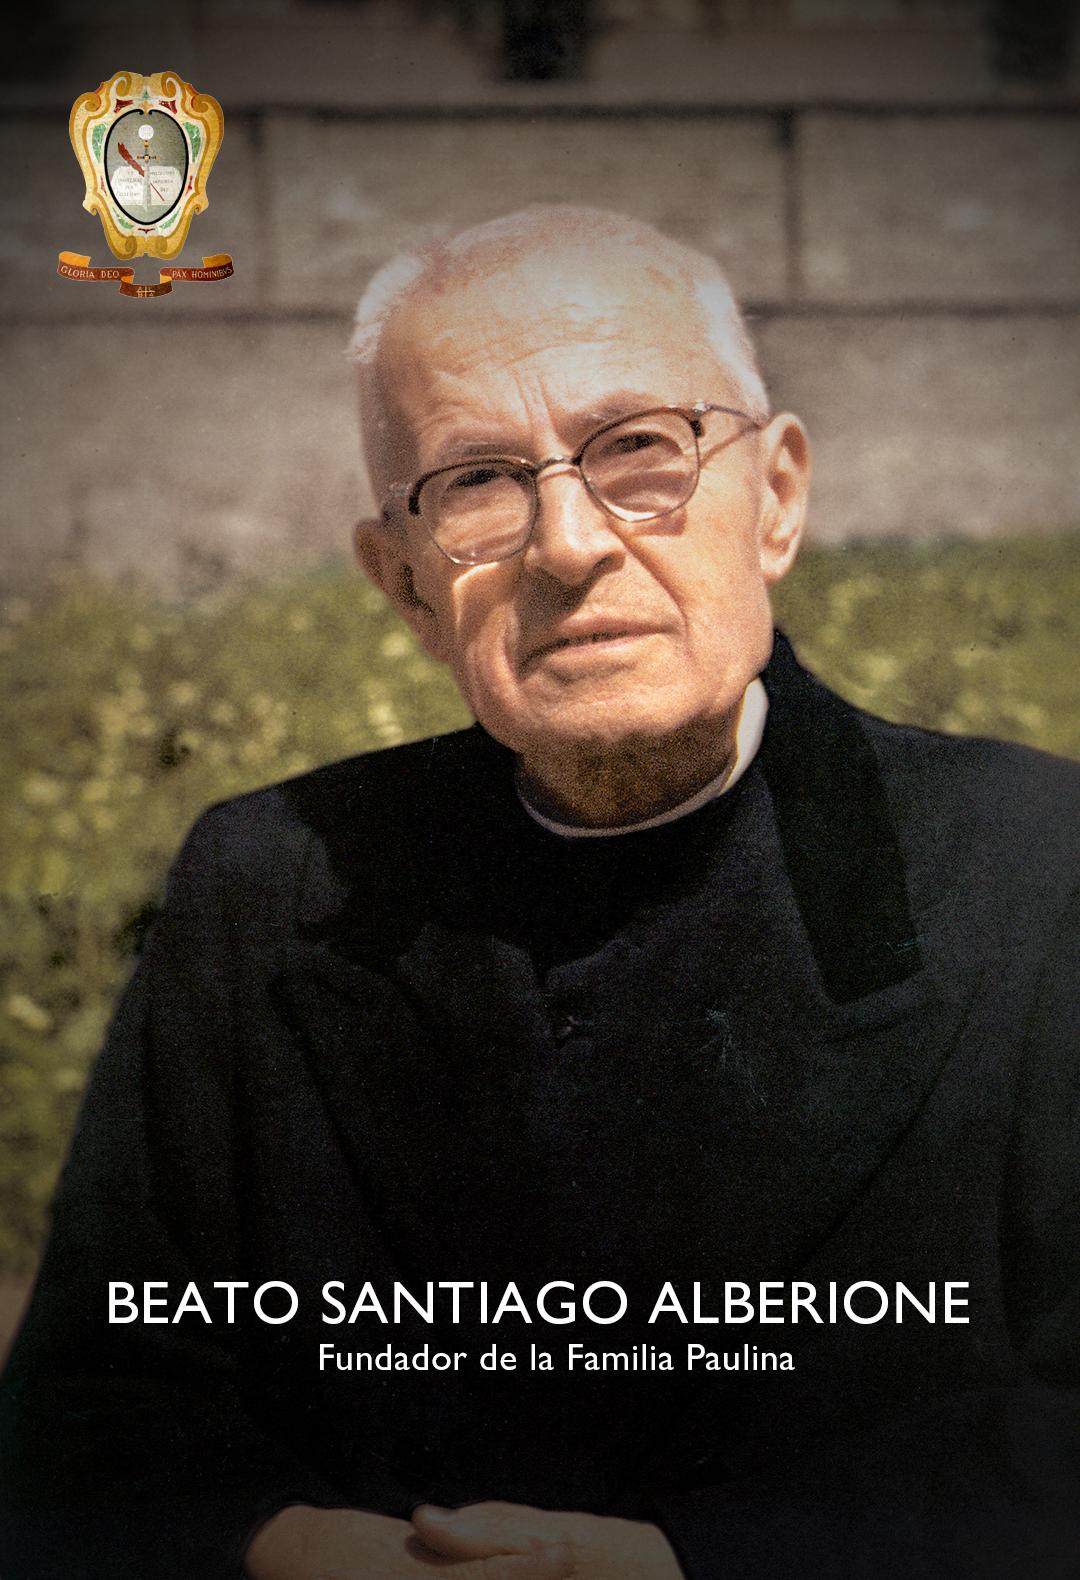 Beato Santiago Alberione